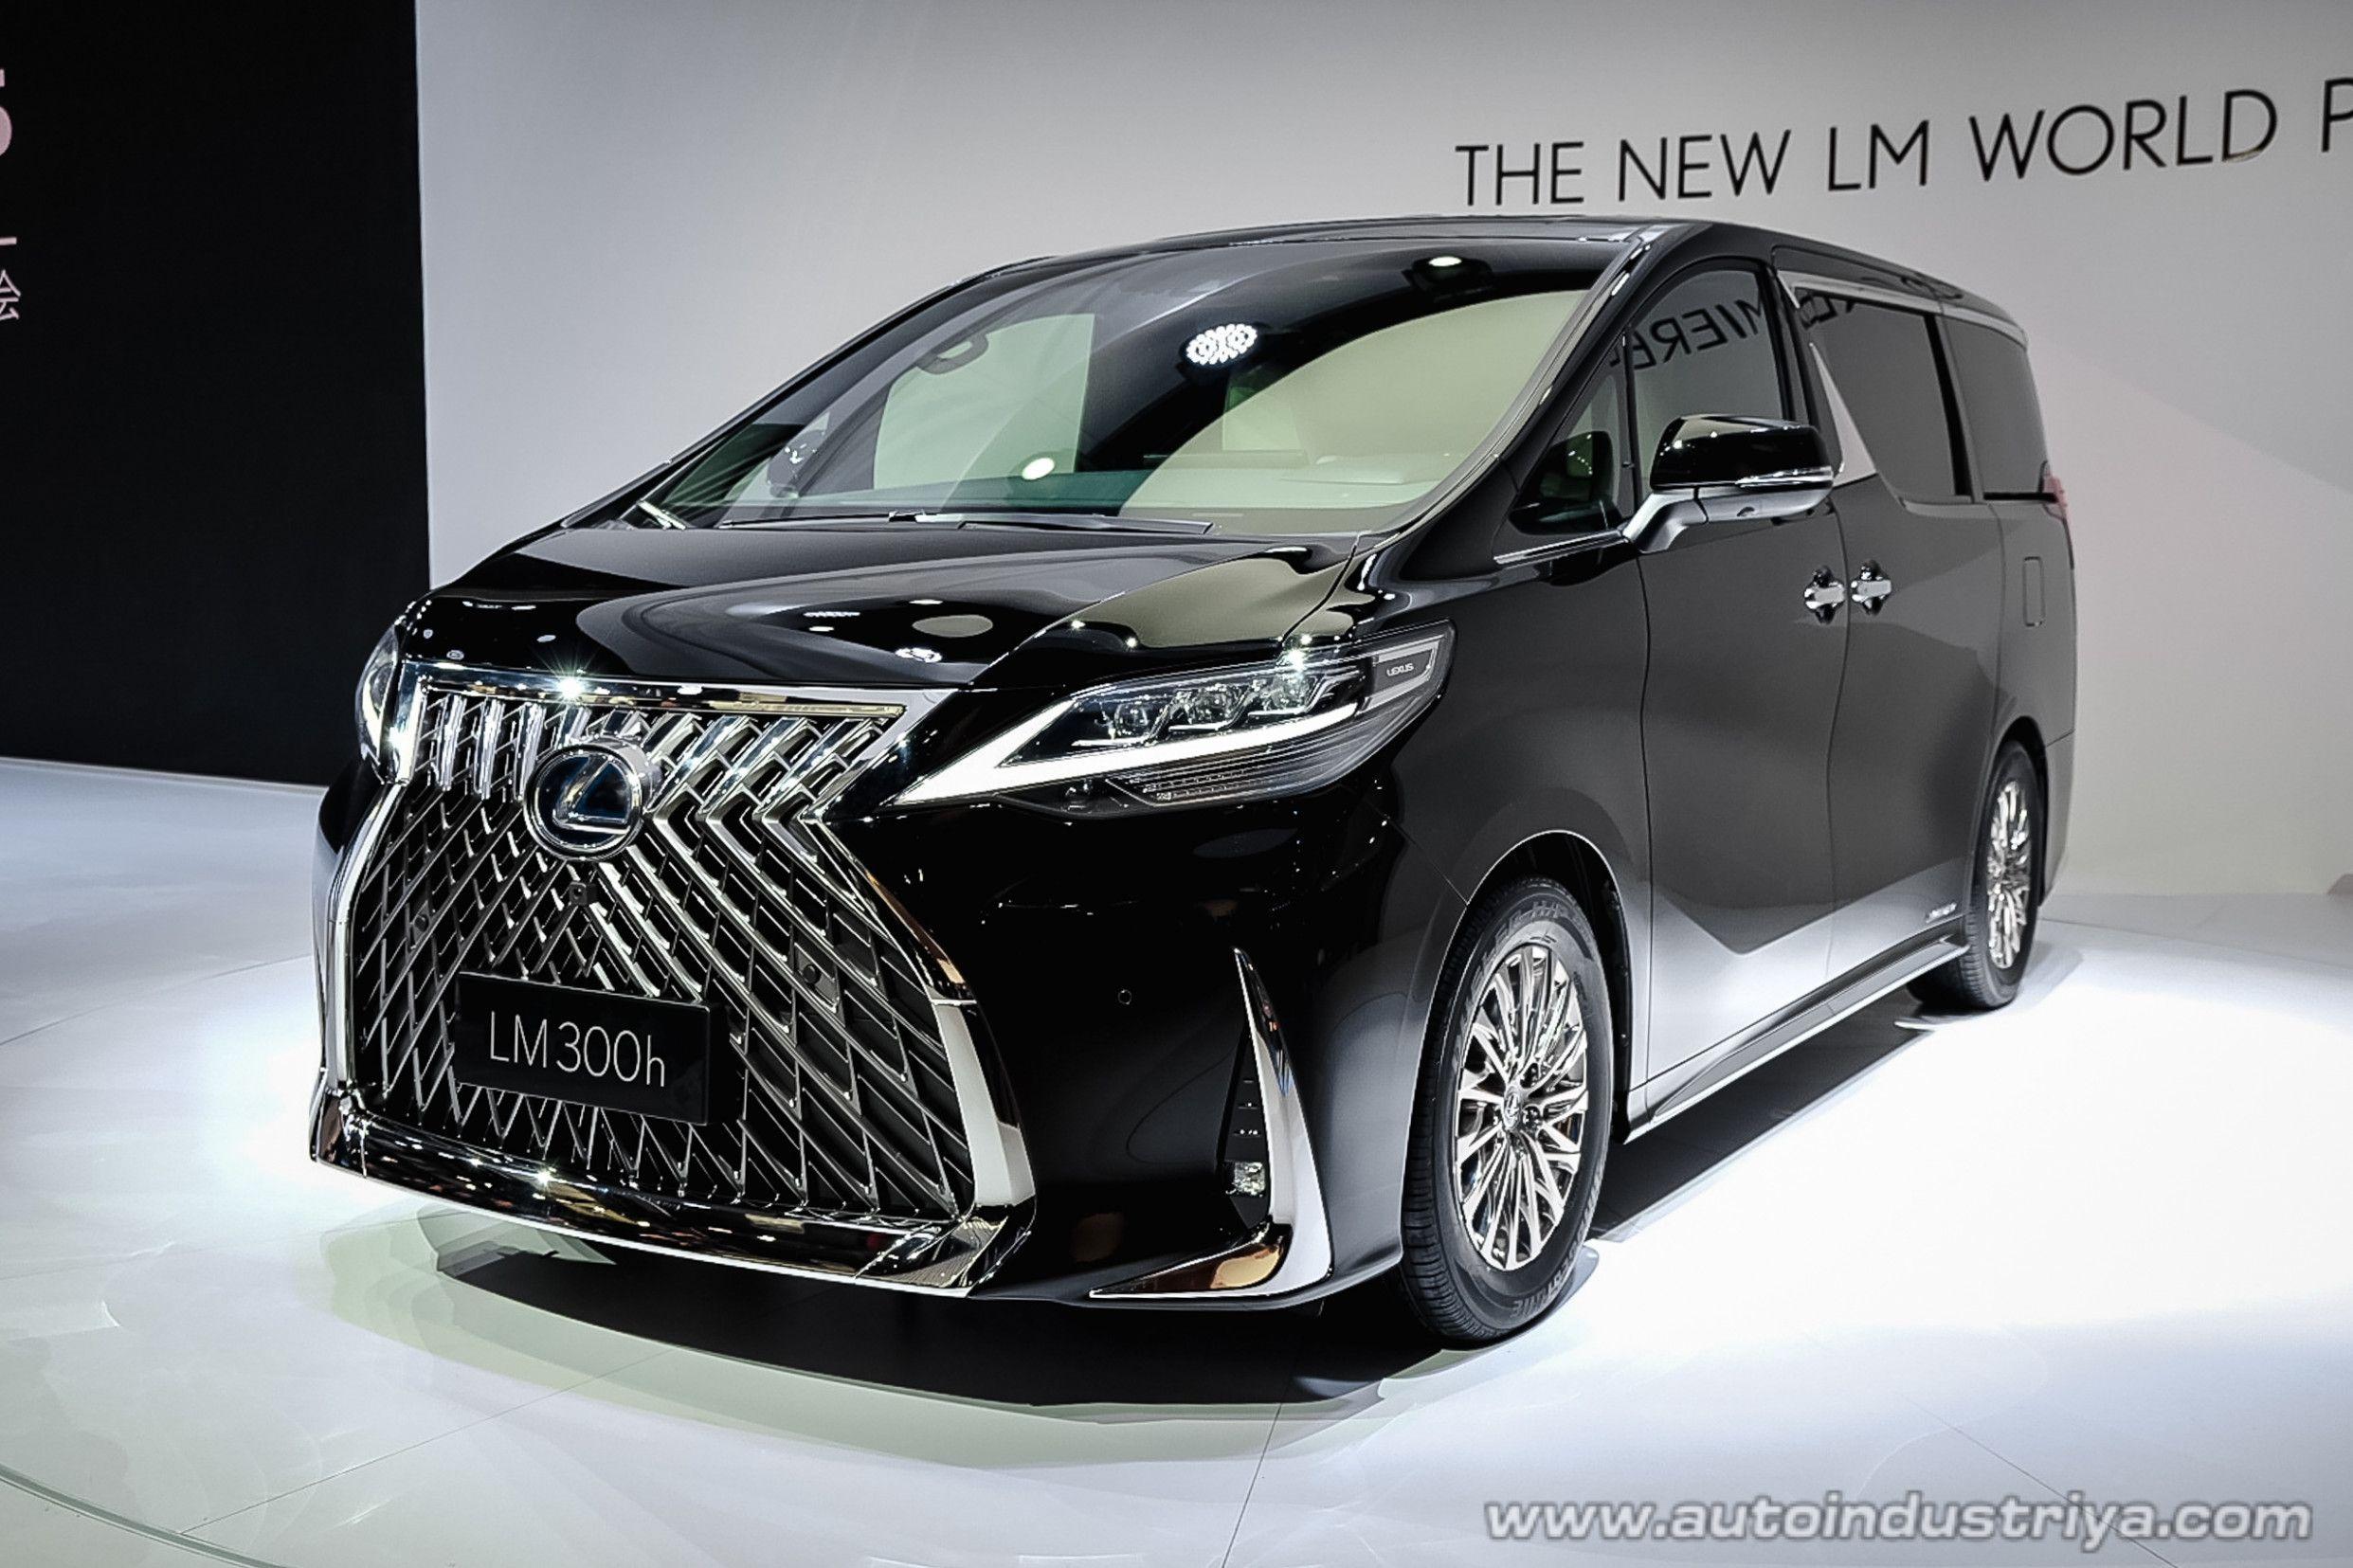 2020 Toyota Alphard Ratings Di 2020 Toyota Camry Mobil Toyota